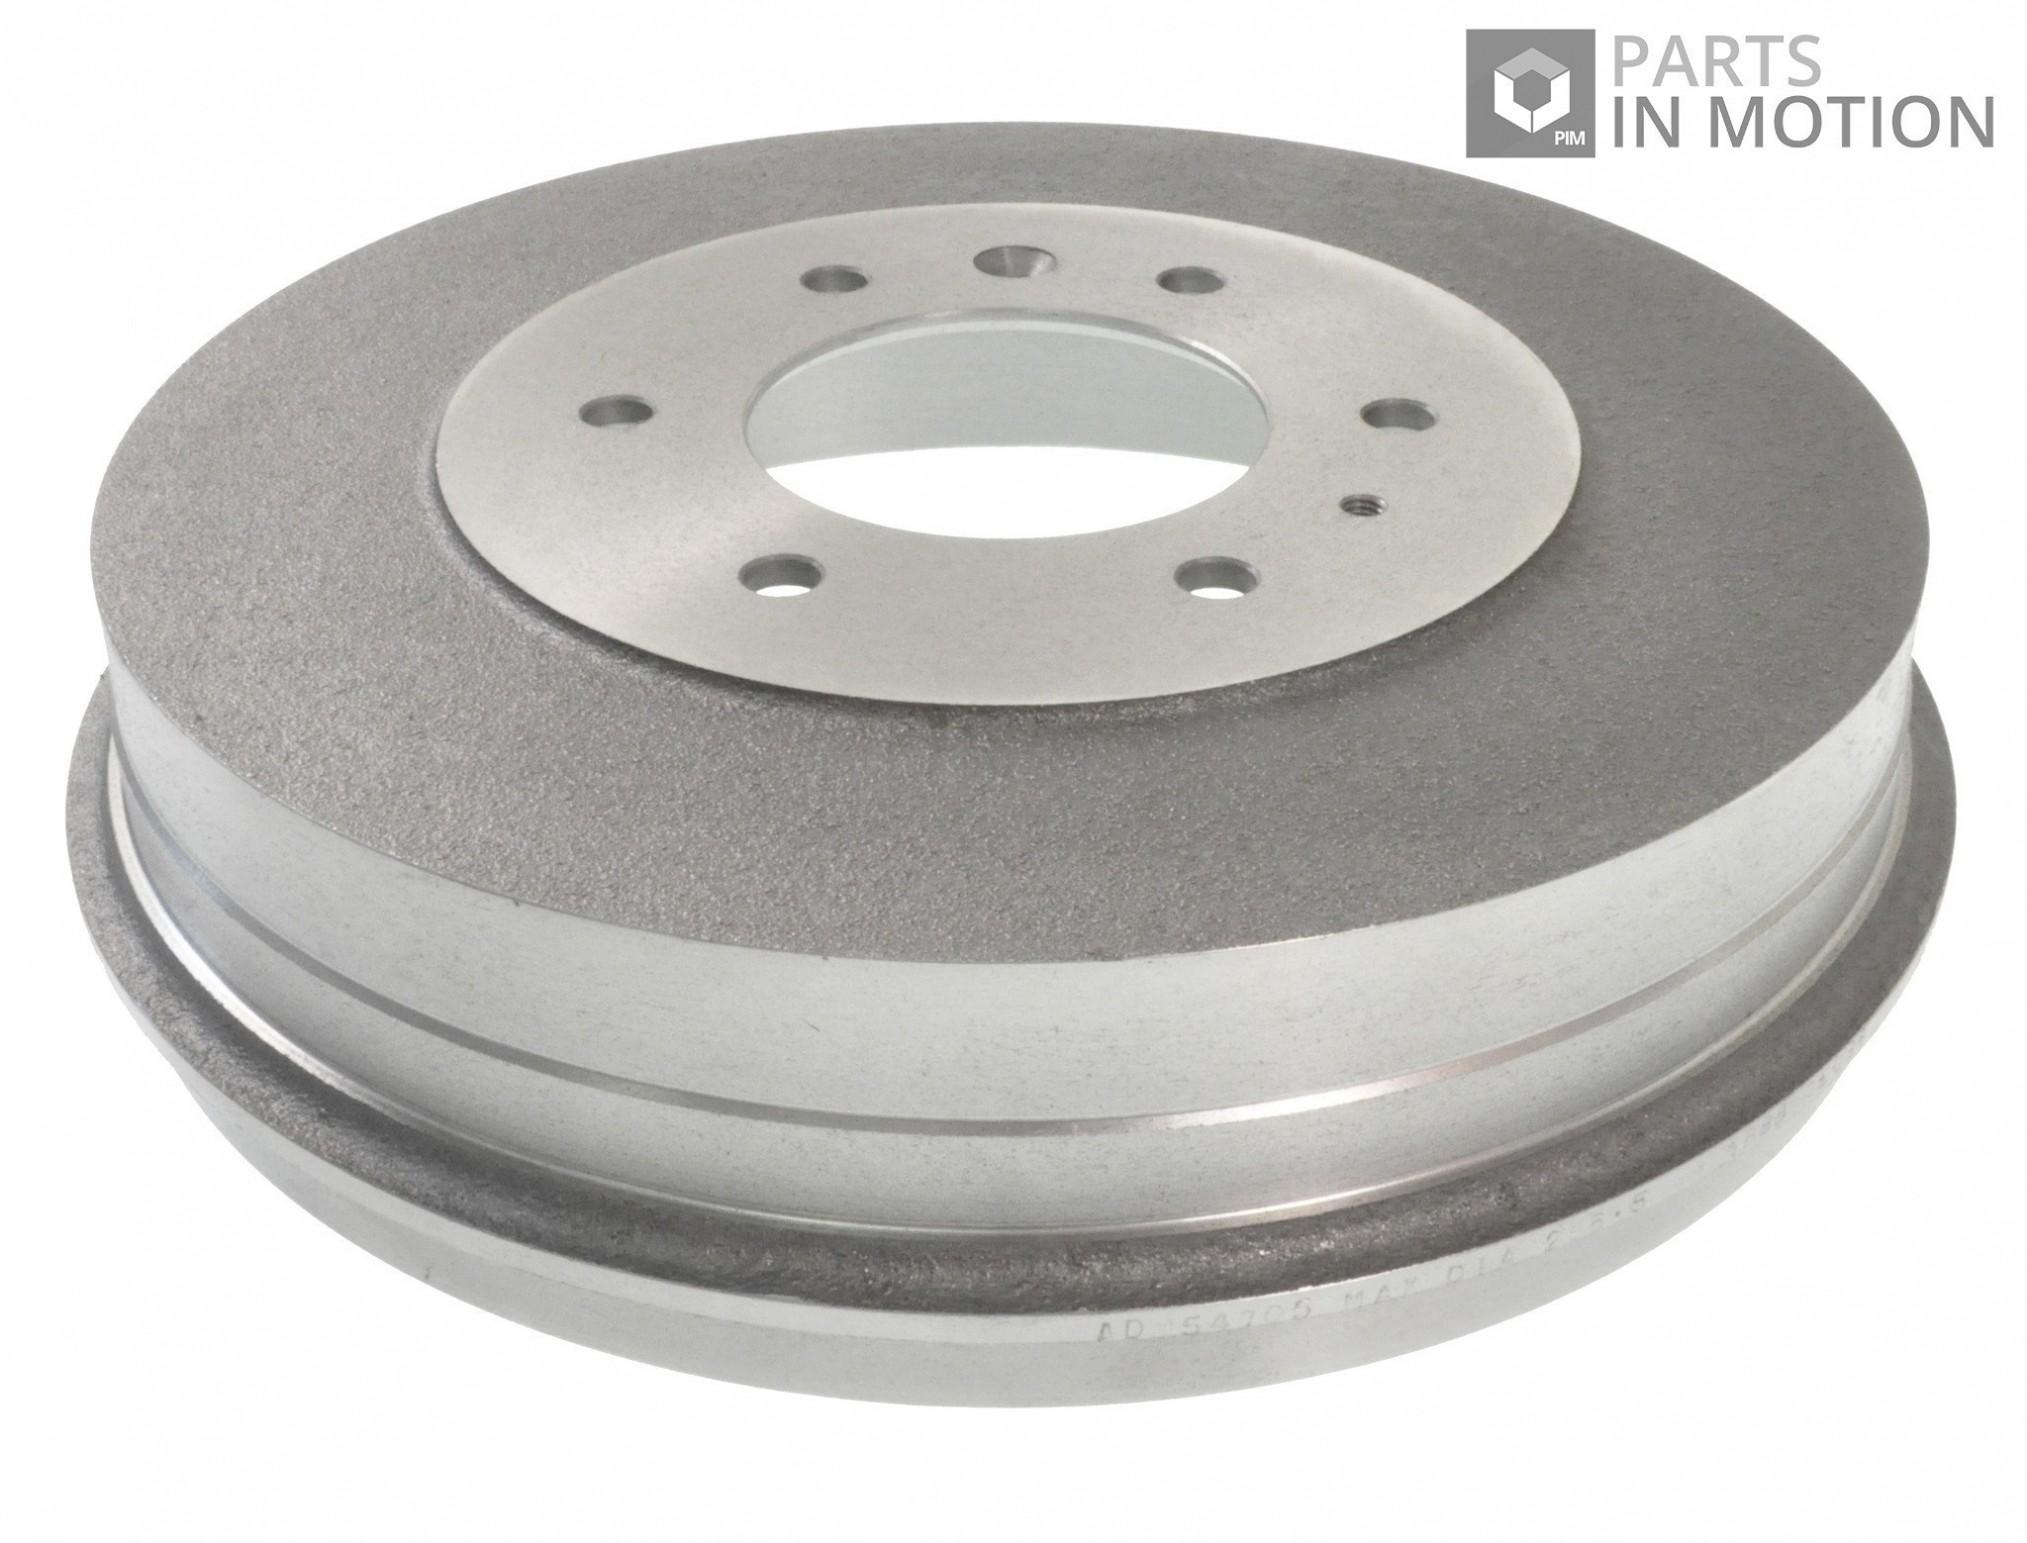 Diagram Of Disc Brakes Brake Parts Diagram — Daytonva150